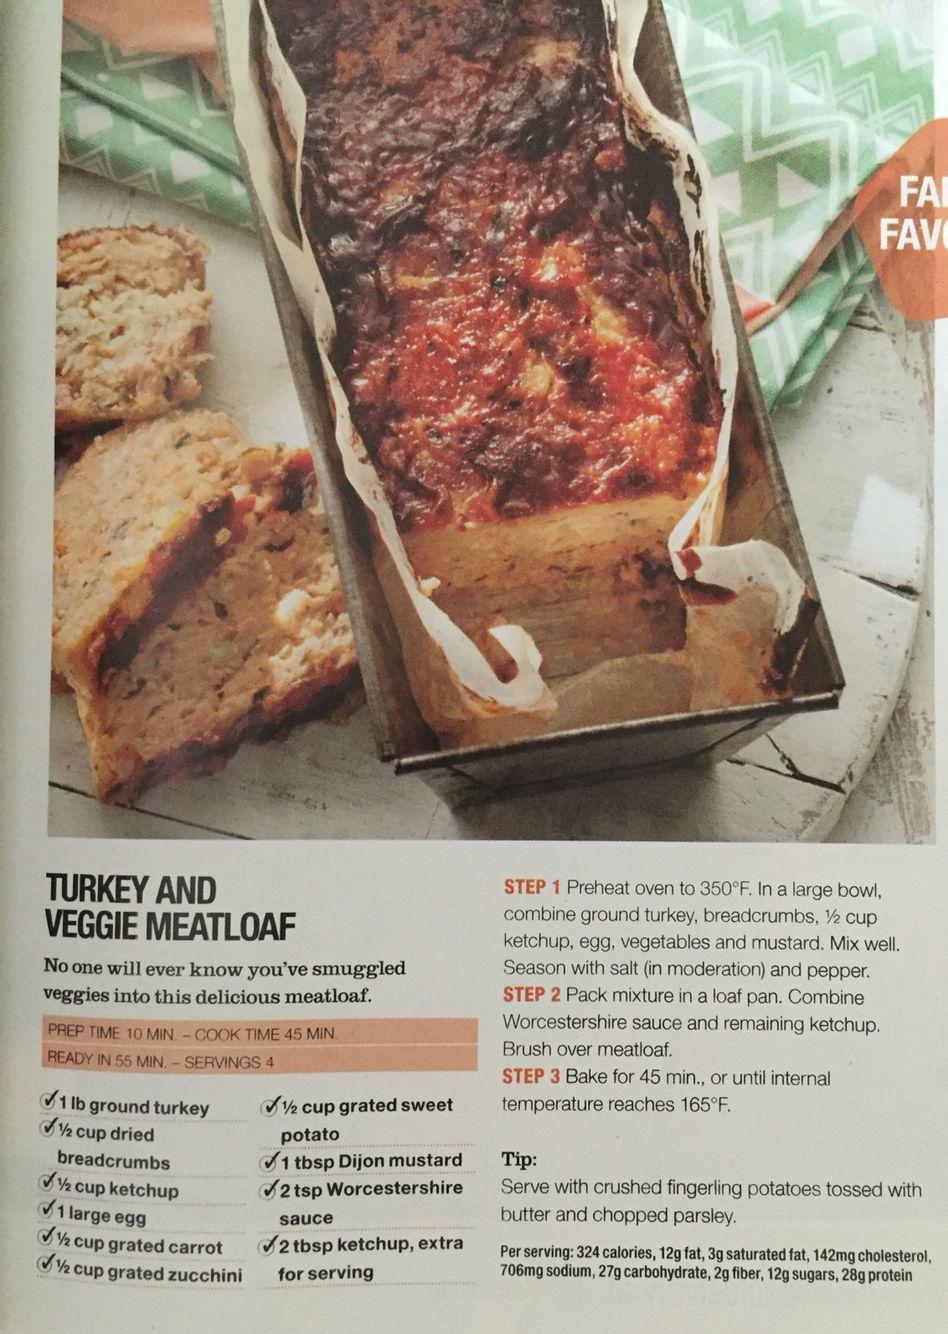 Turkey & veggie meatloaf